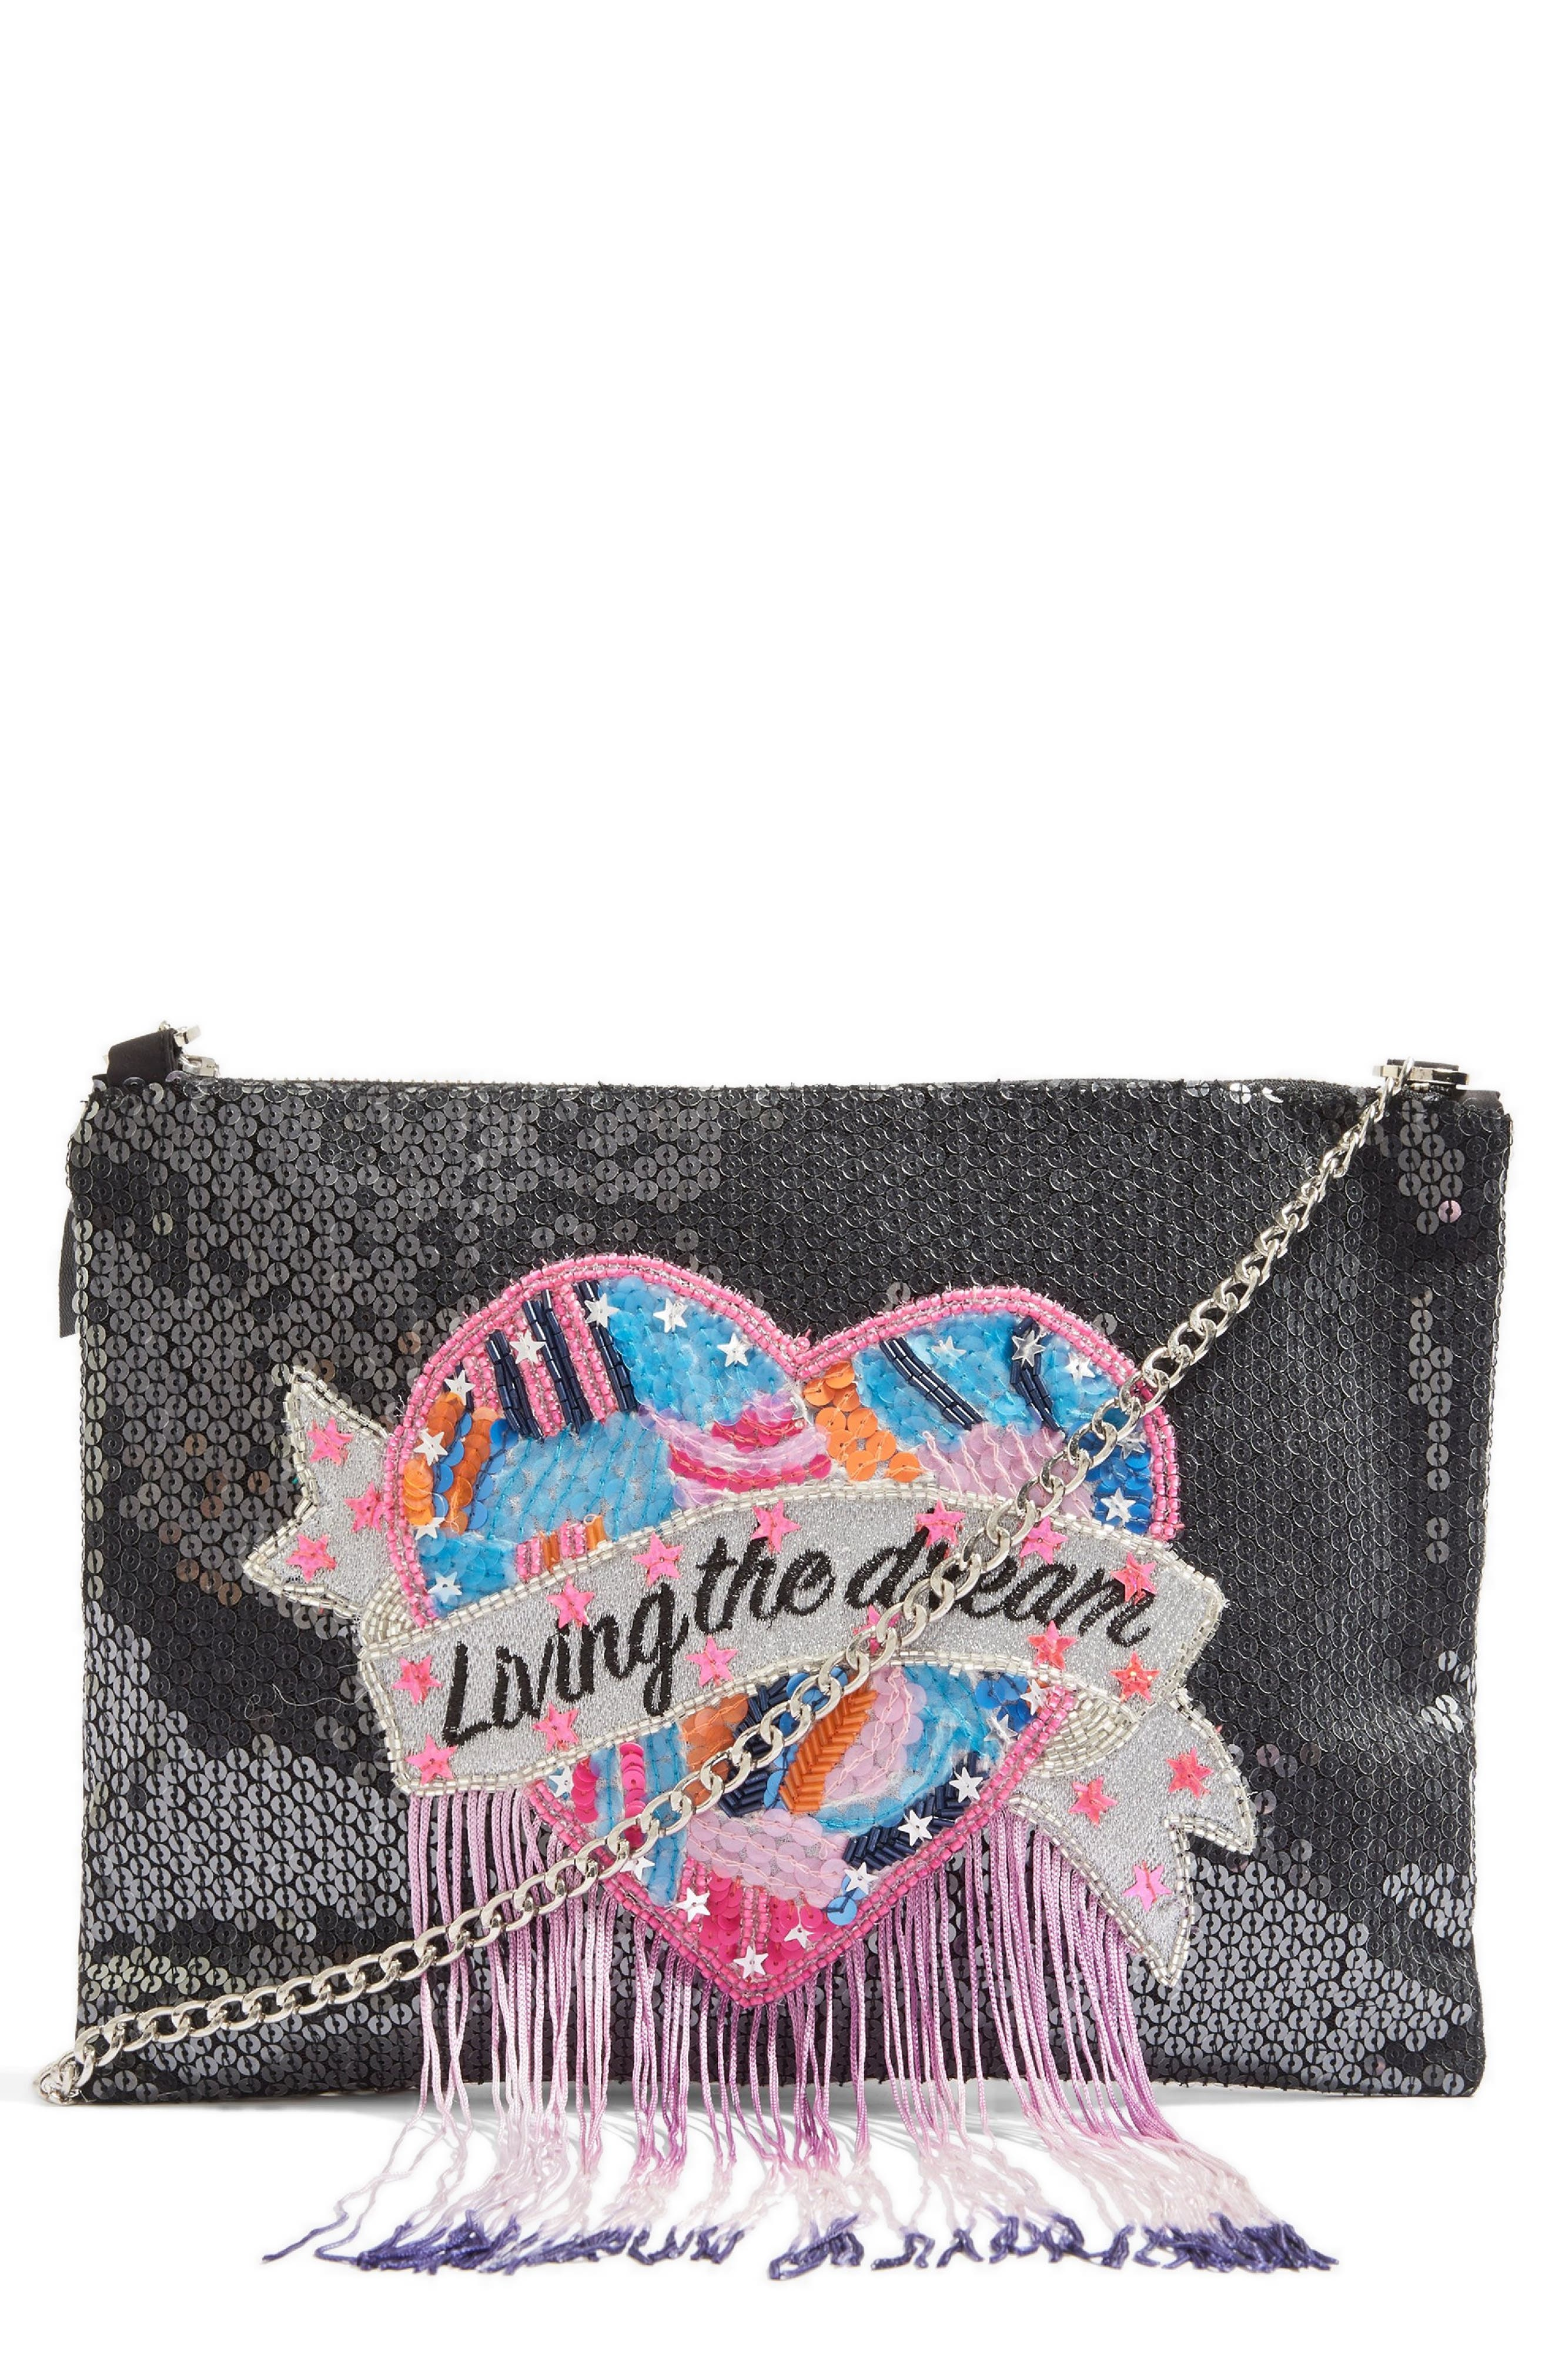 Living The Dream Crossbody Bag,                             Main thumbnail 1, color,                             001